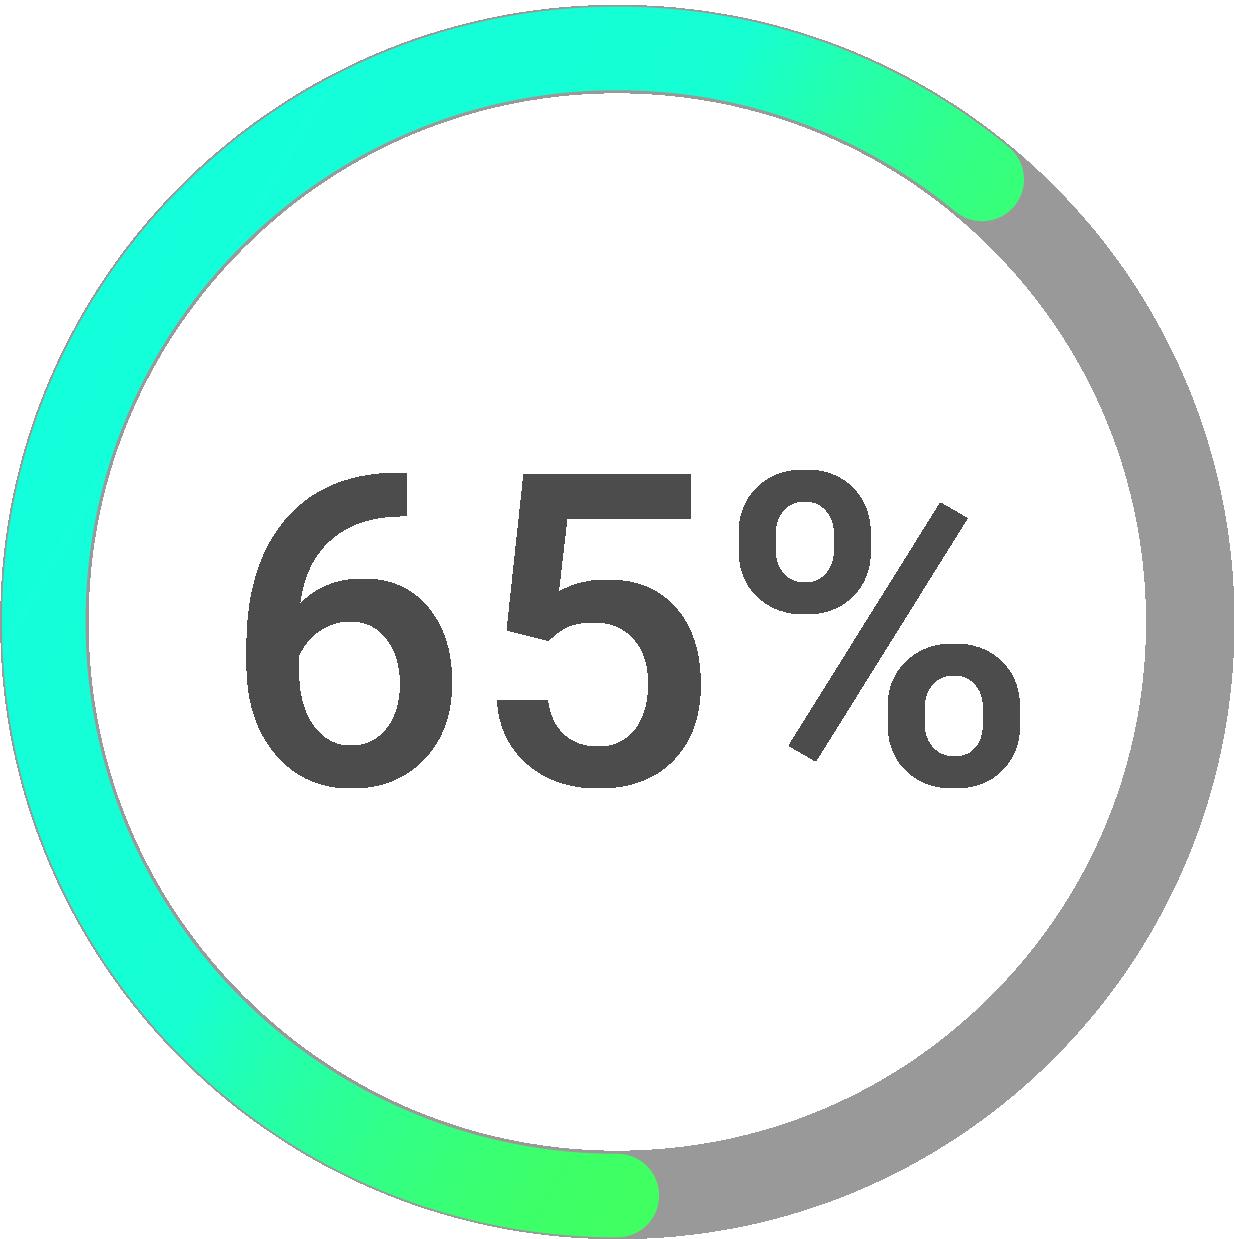 Circle progress icon percentage 65%